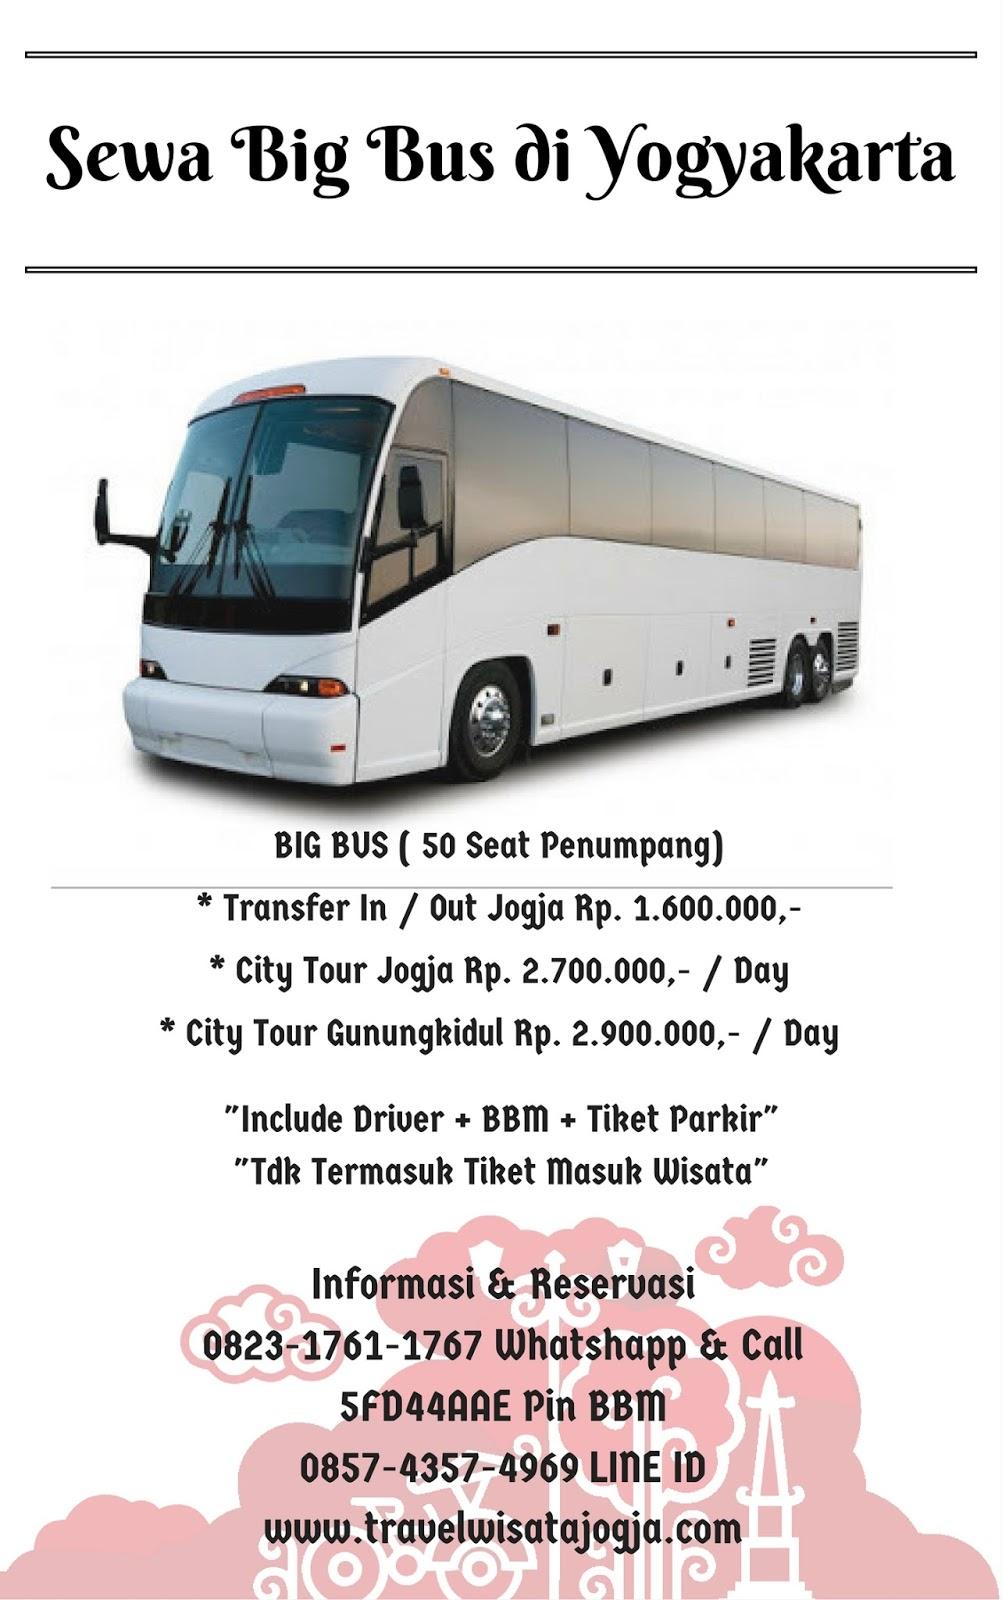 Sewa BIG BUS 50 Seat di Yogyakarta